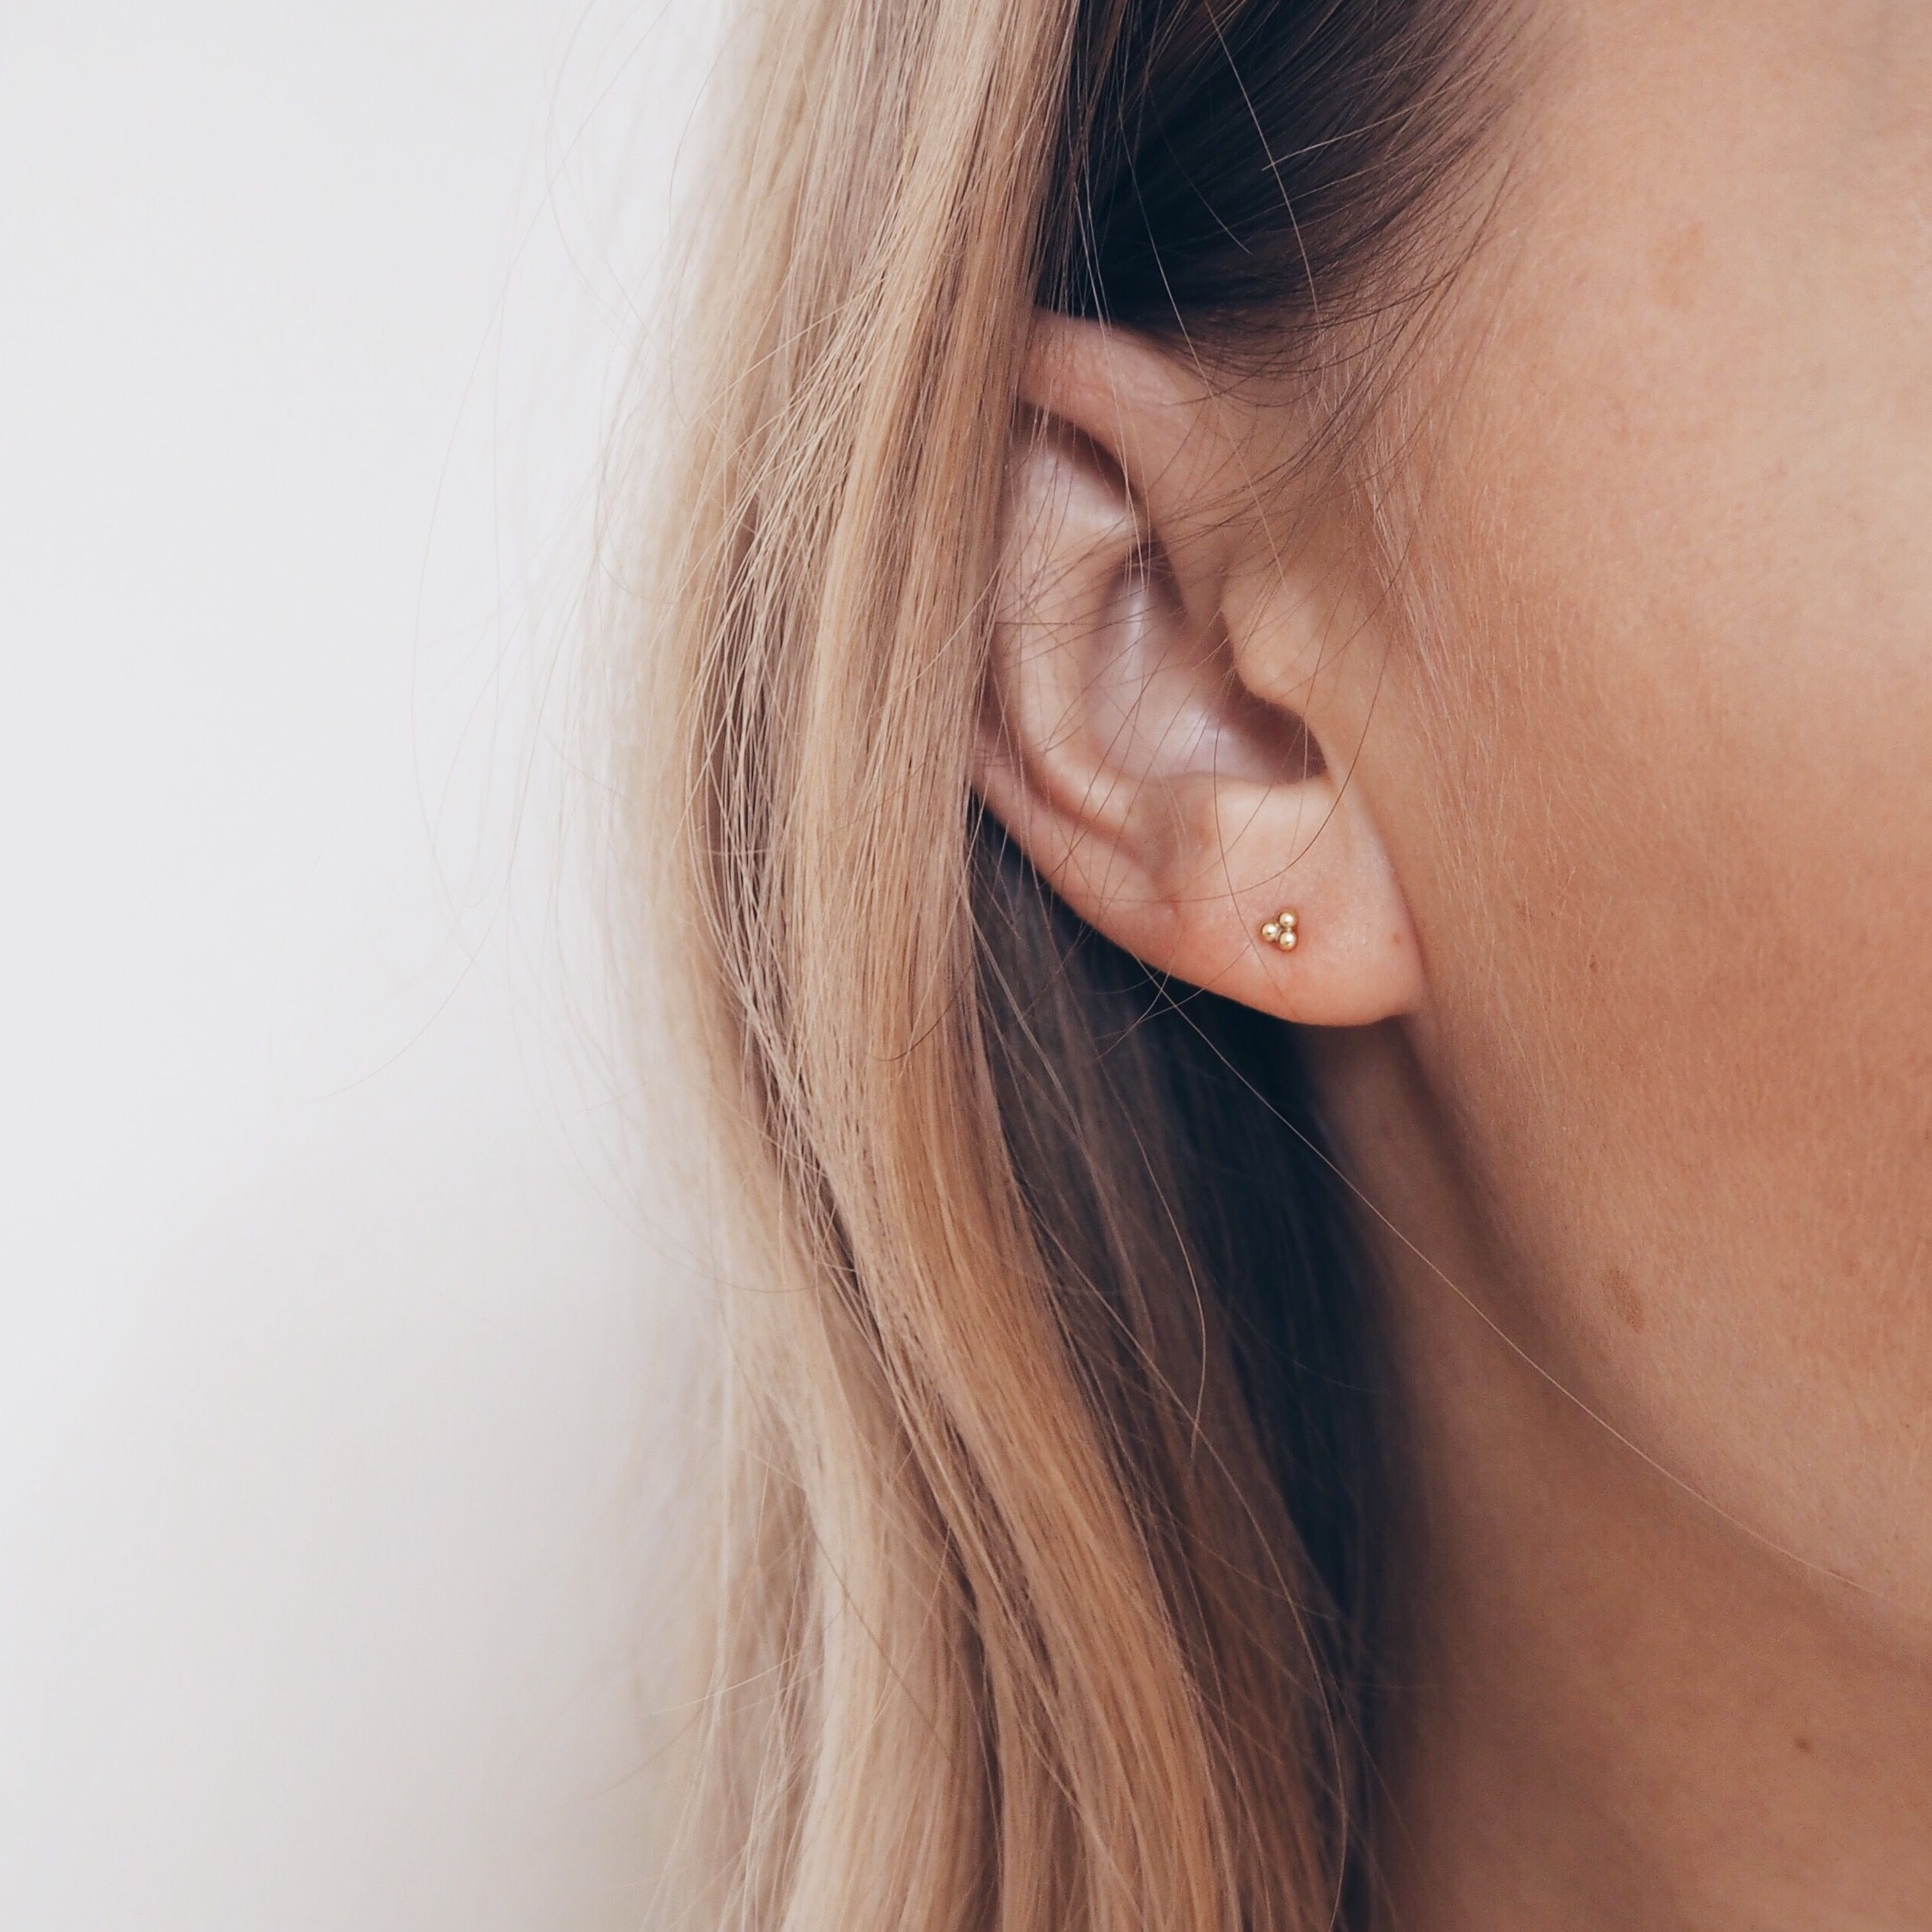 Ear piercing ideas simple  Pin by Thạch Nguyễn Ngọc on Bông tai bạc nữ Snowflake Earrings